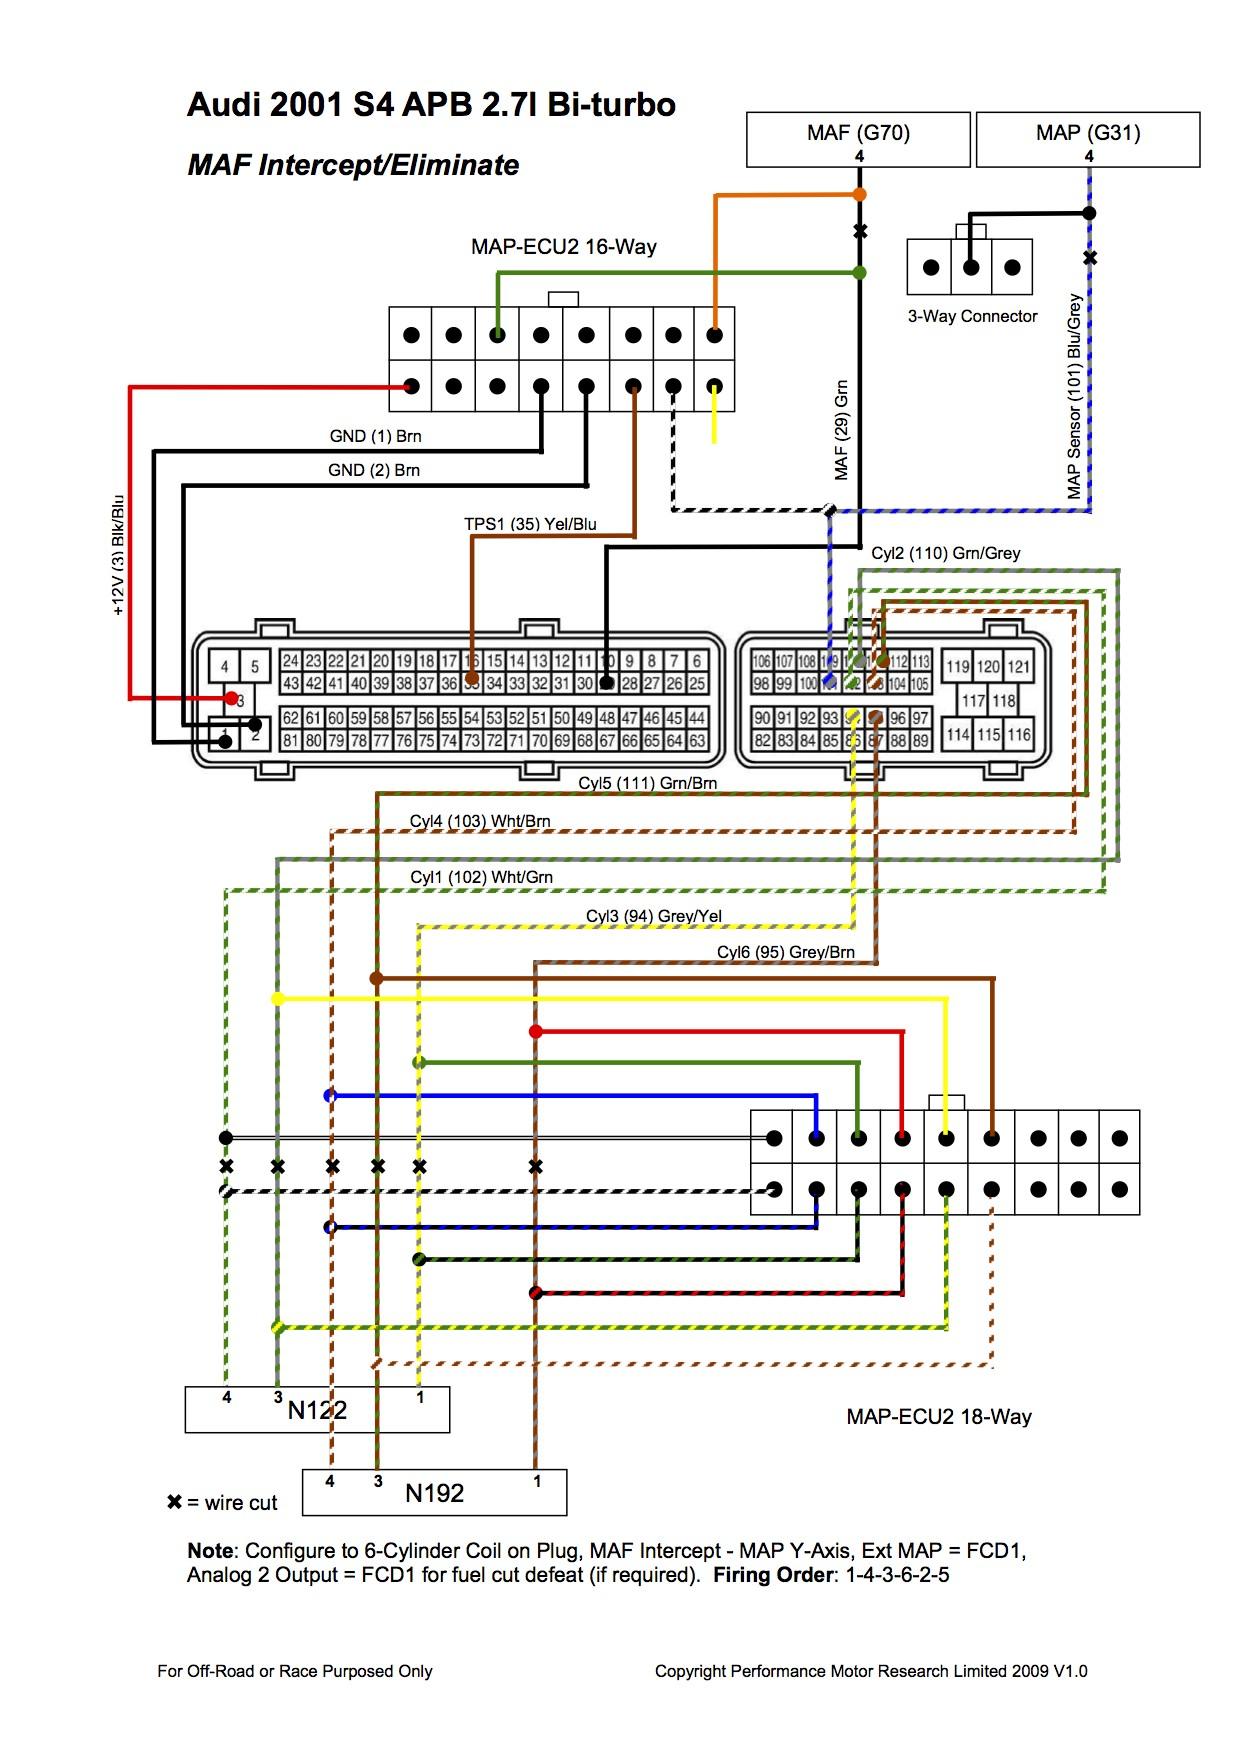 2g Eclipse Headlight Wiring Harness | Online Wiring Diagram on